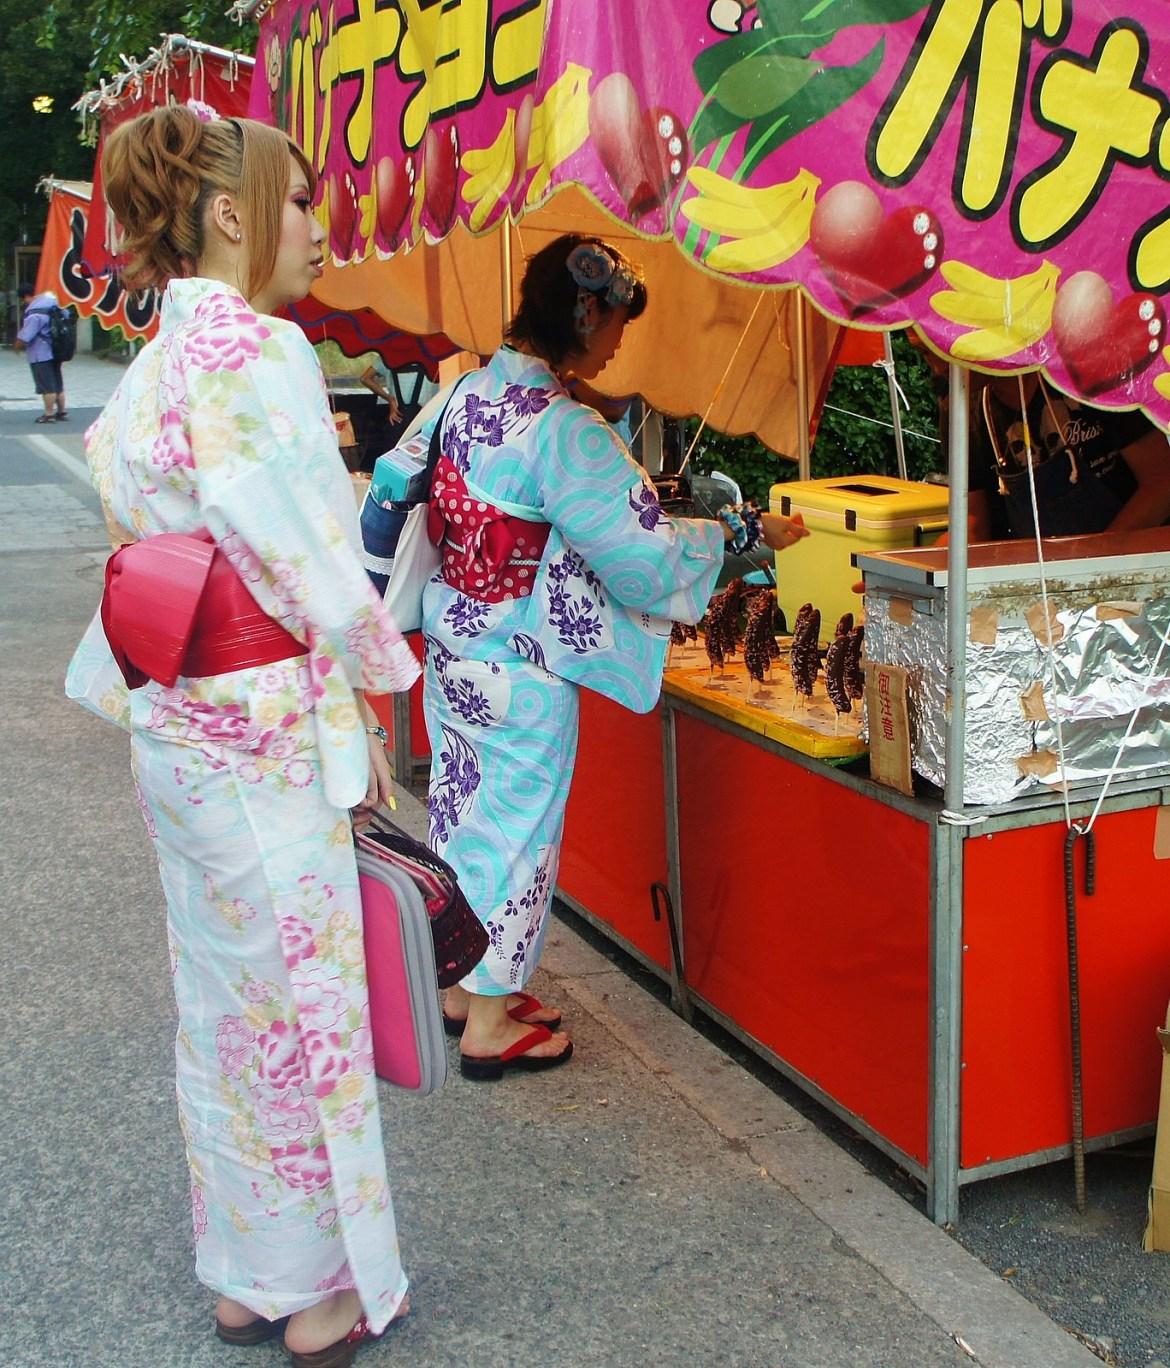 Chocolate Banana and Kimono at Ueno Park